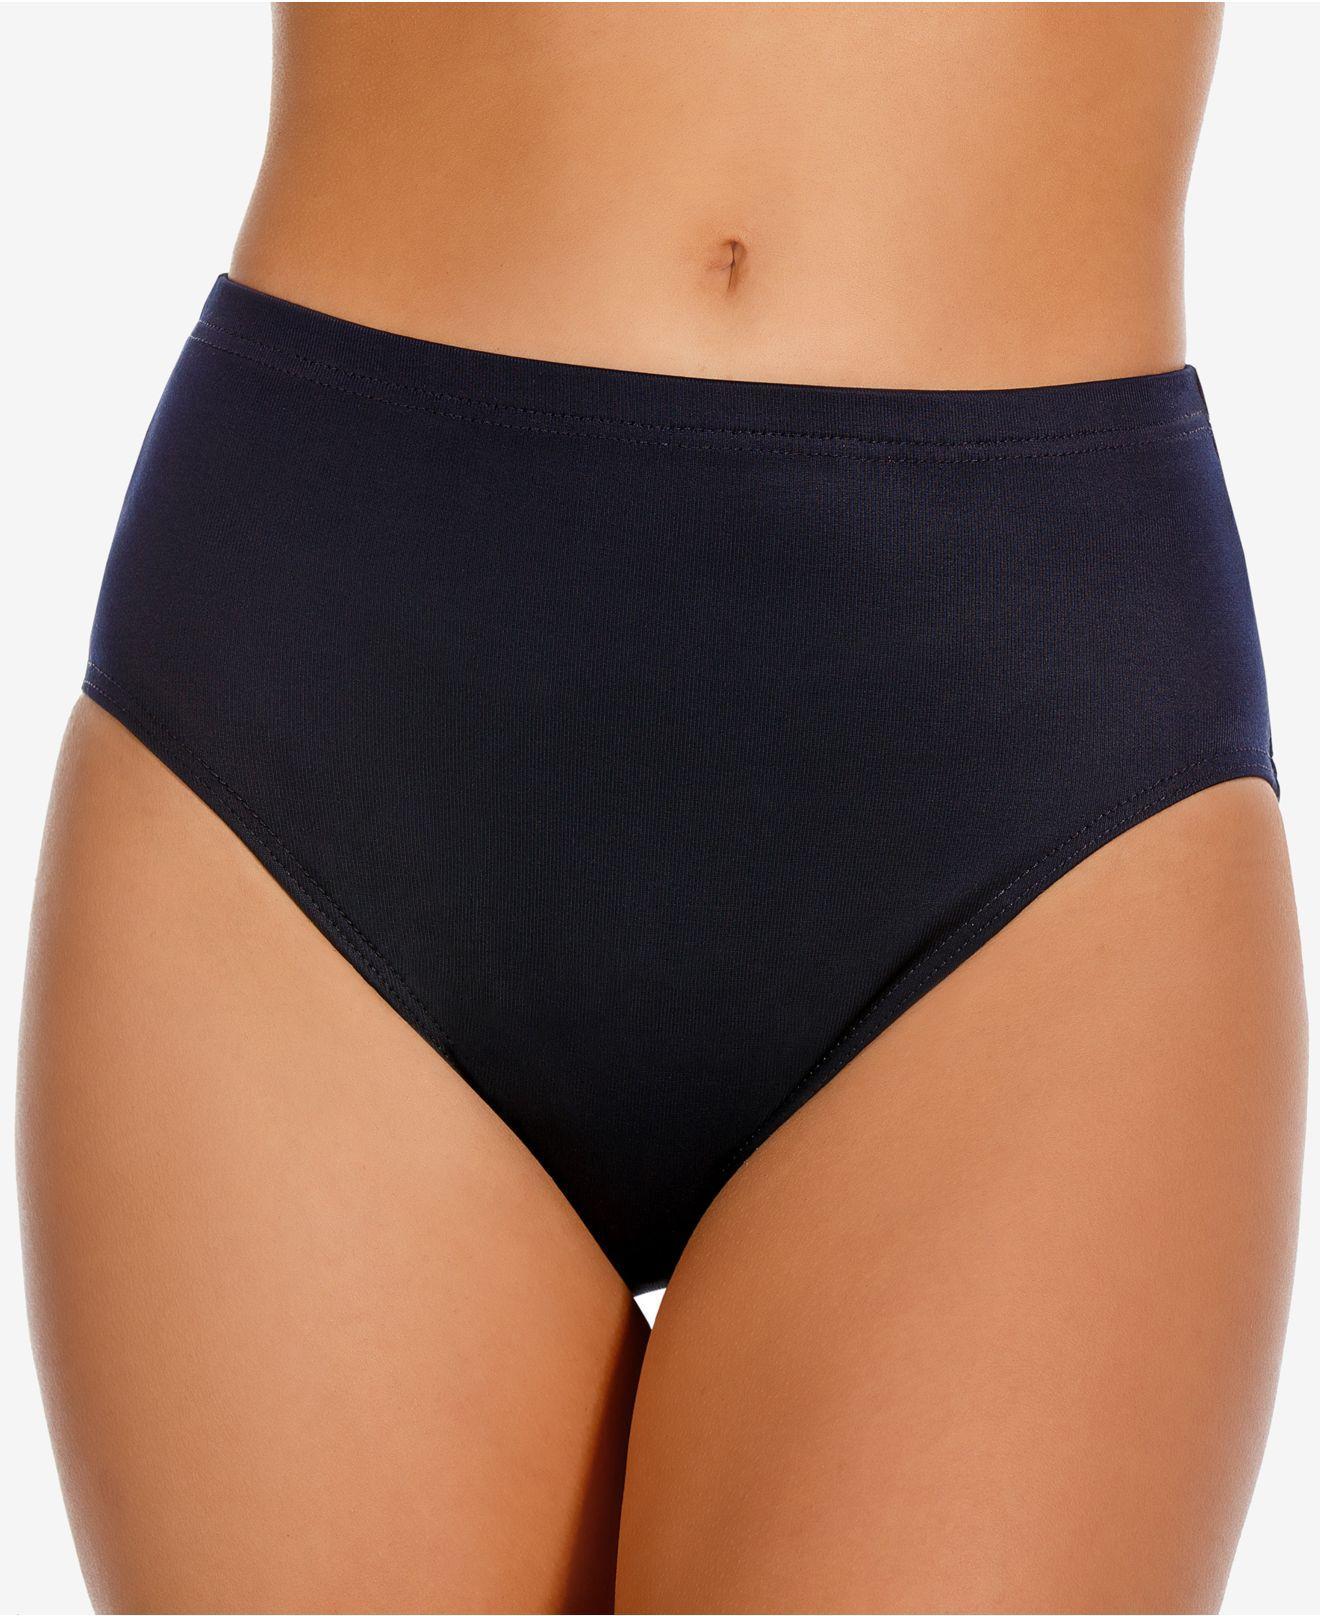 d10d7d0d15 Lyst - Miraclesuit High-waist Tummy Control Bikini Bottoms in Blue